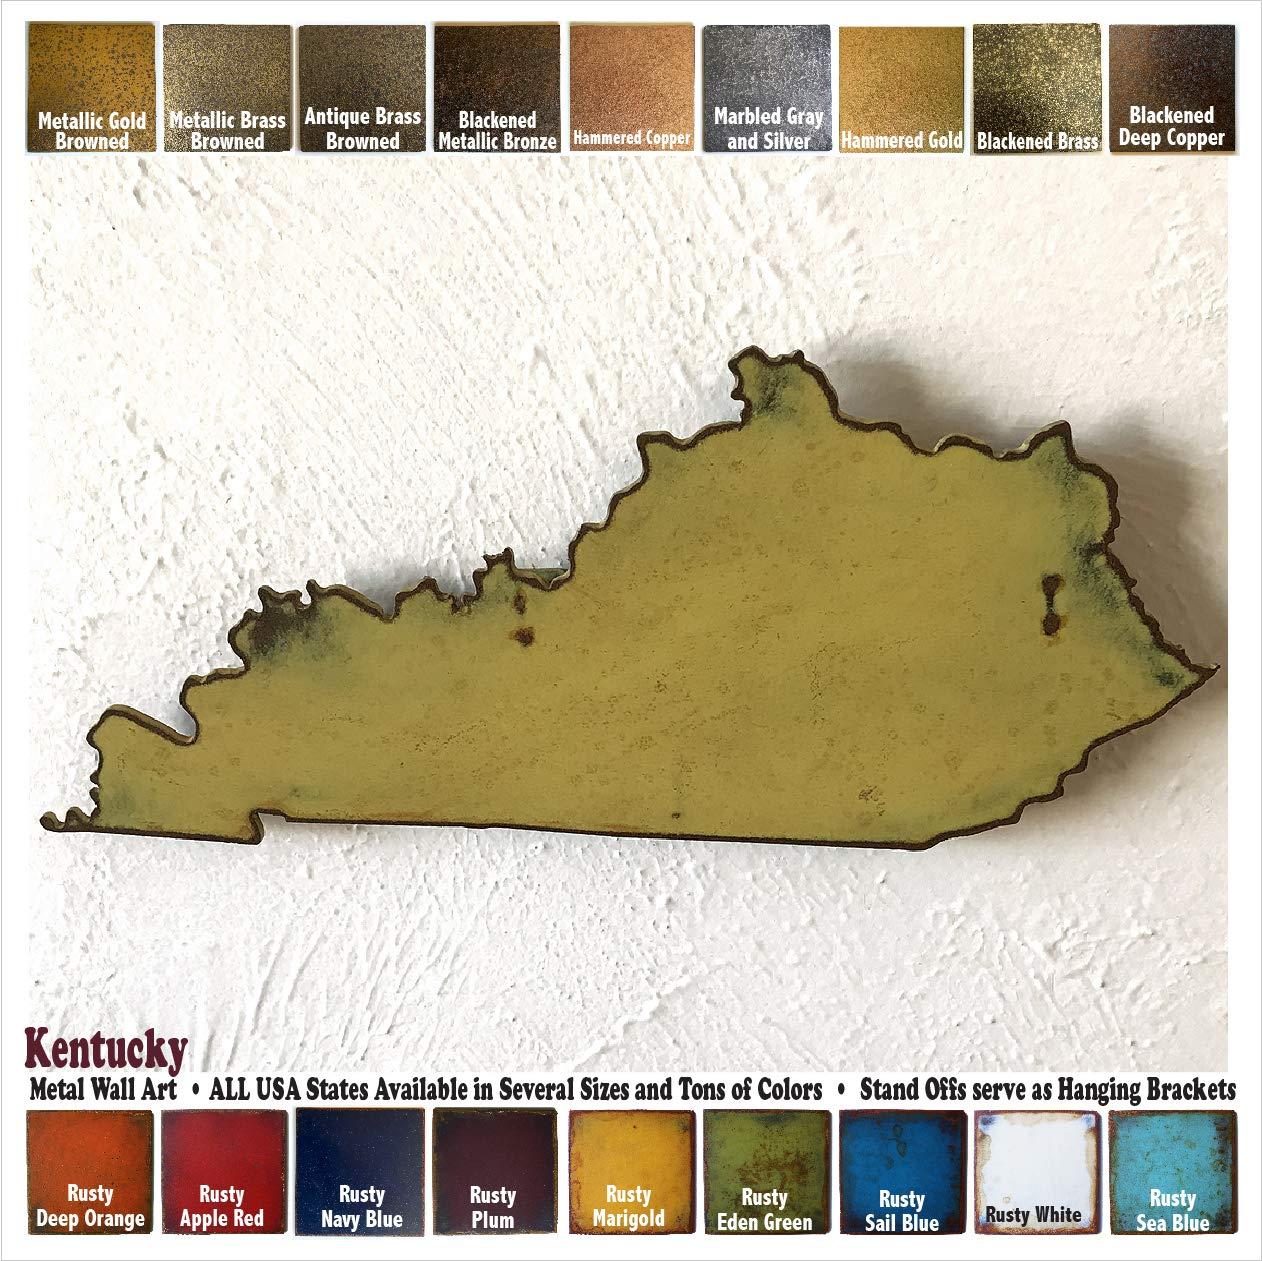 Amazon.com: Kentucky metal wall art - Choose 11\